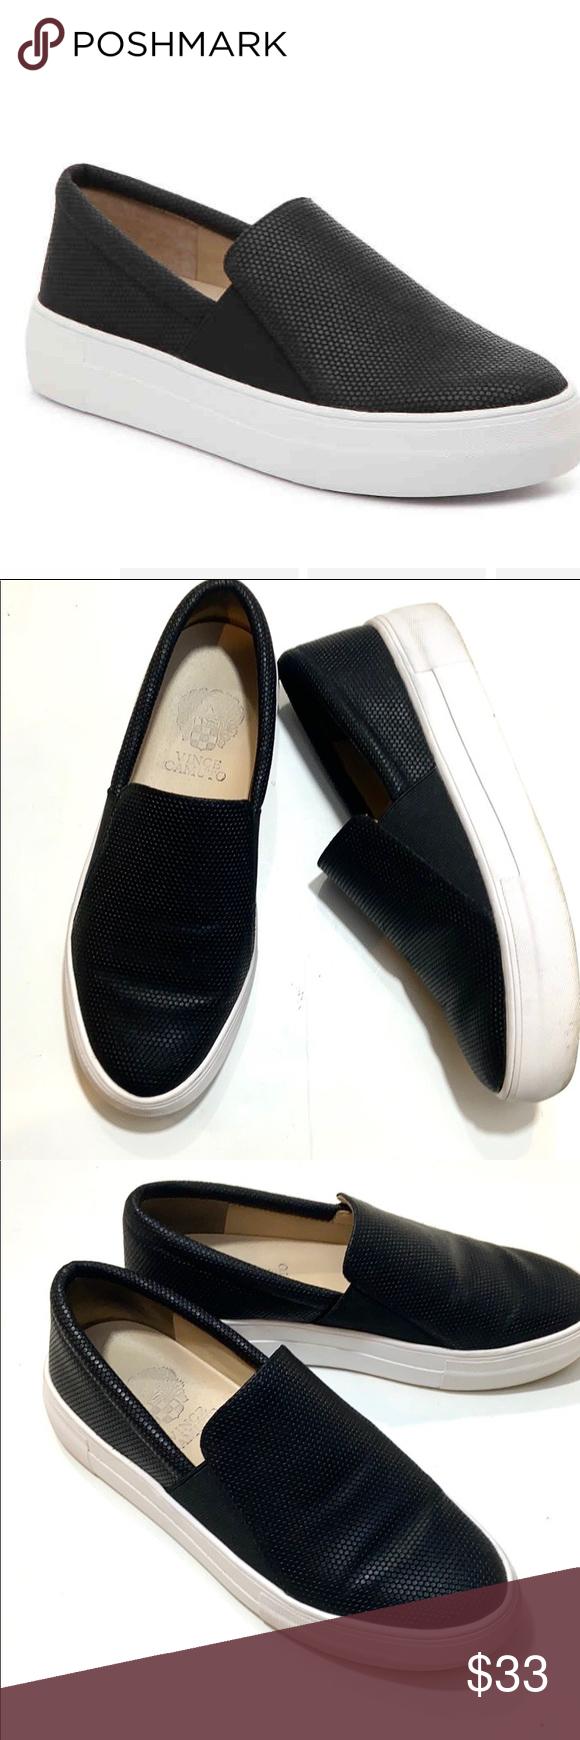 Vince Camuto Kanesya Platform Sneakers